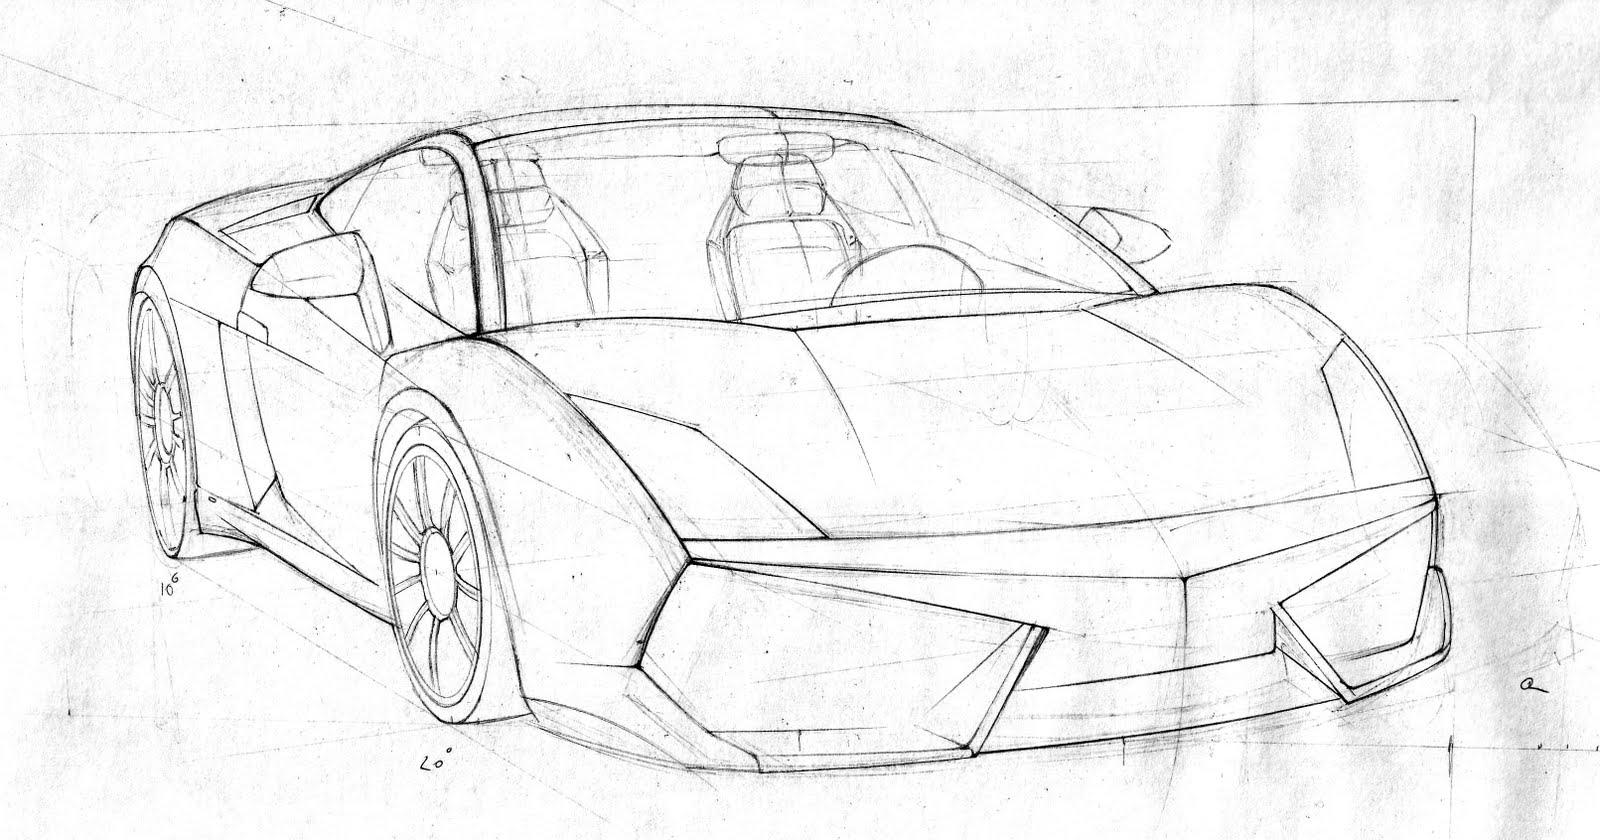 Un stylet et des crayons: Lamborghini Gallardo